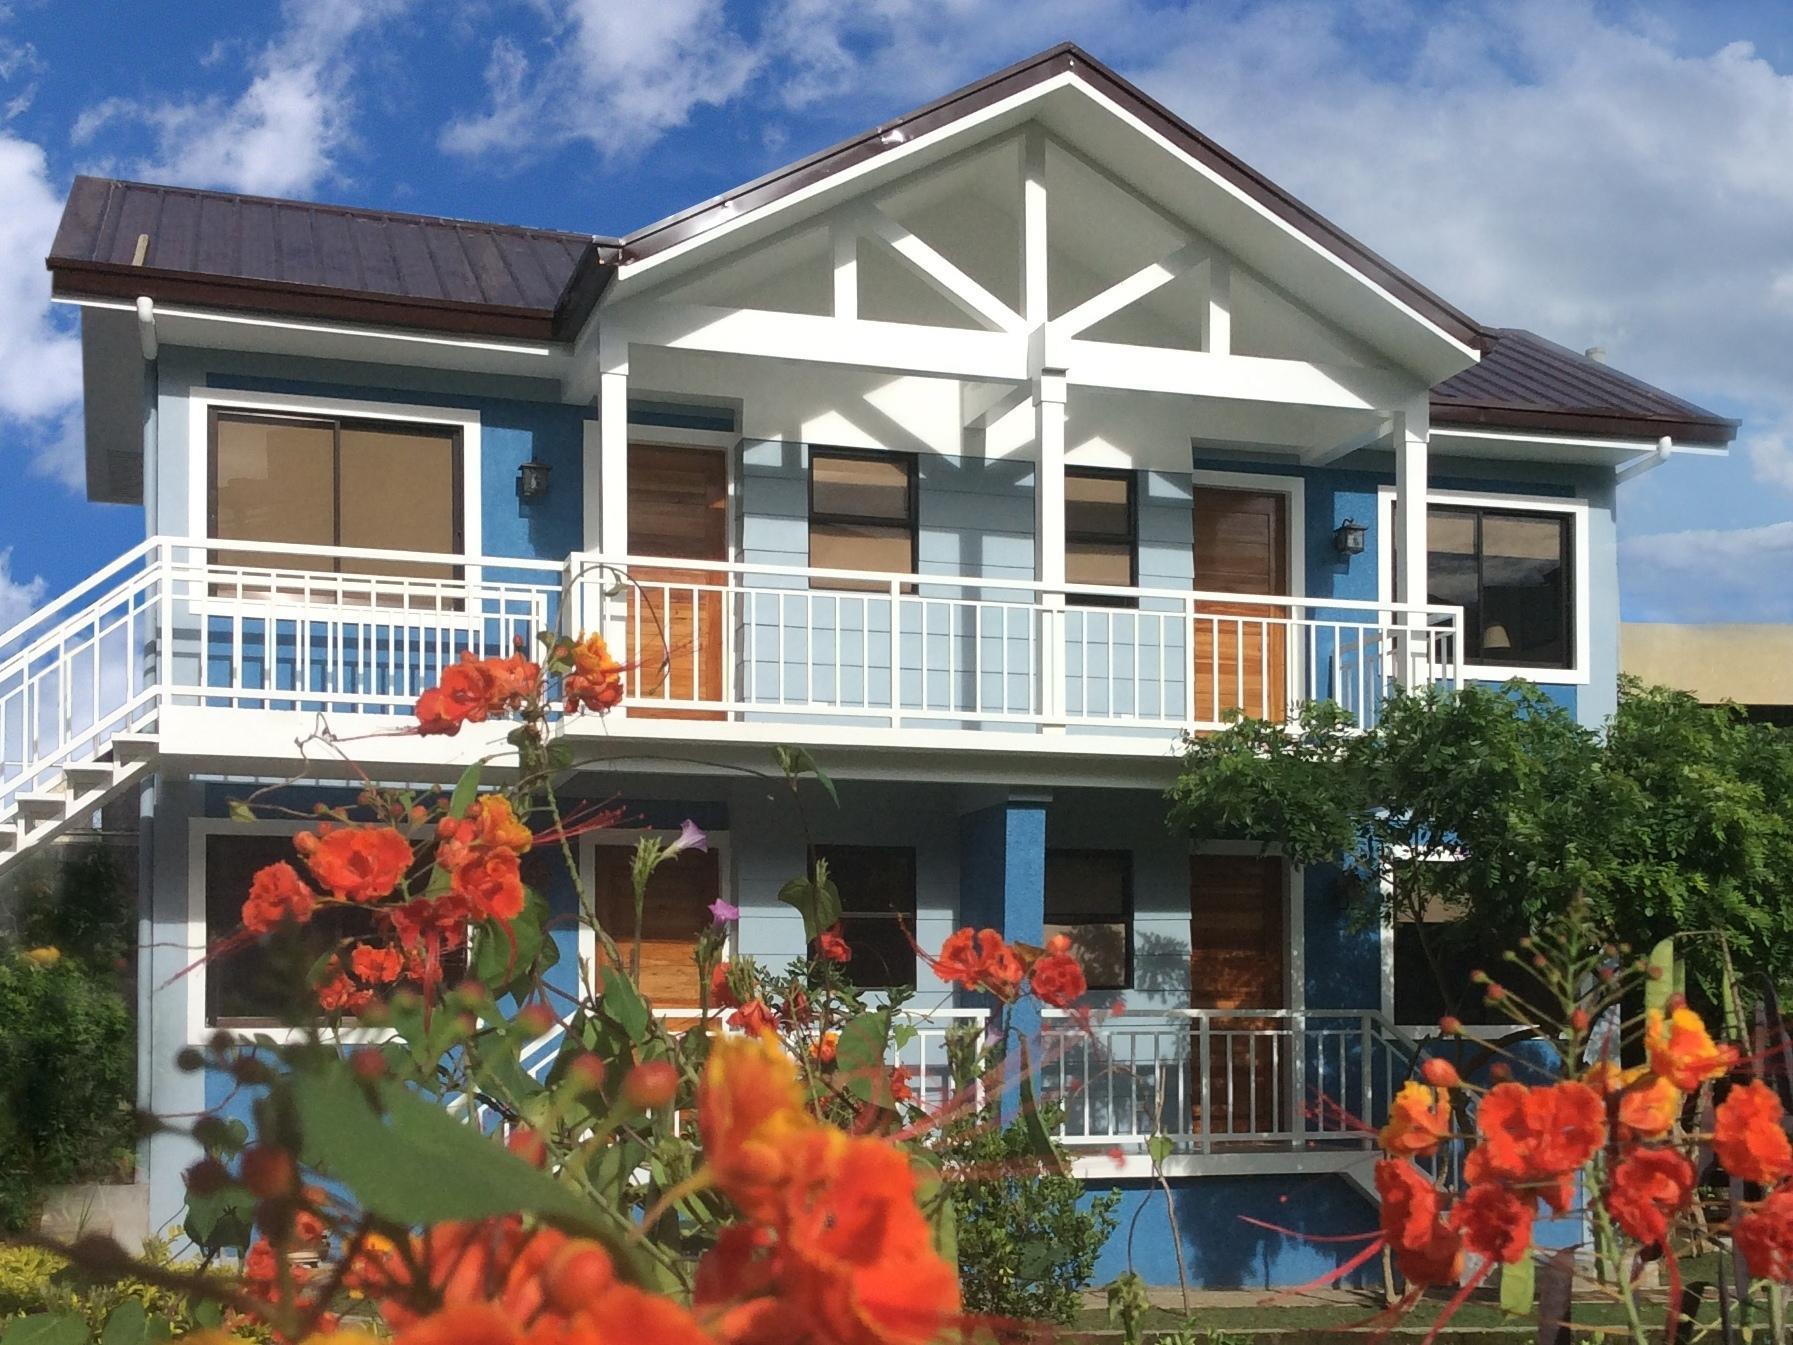 The Carmelence Lodge